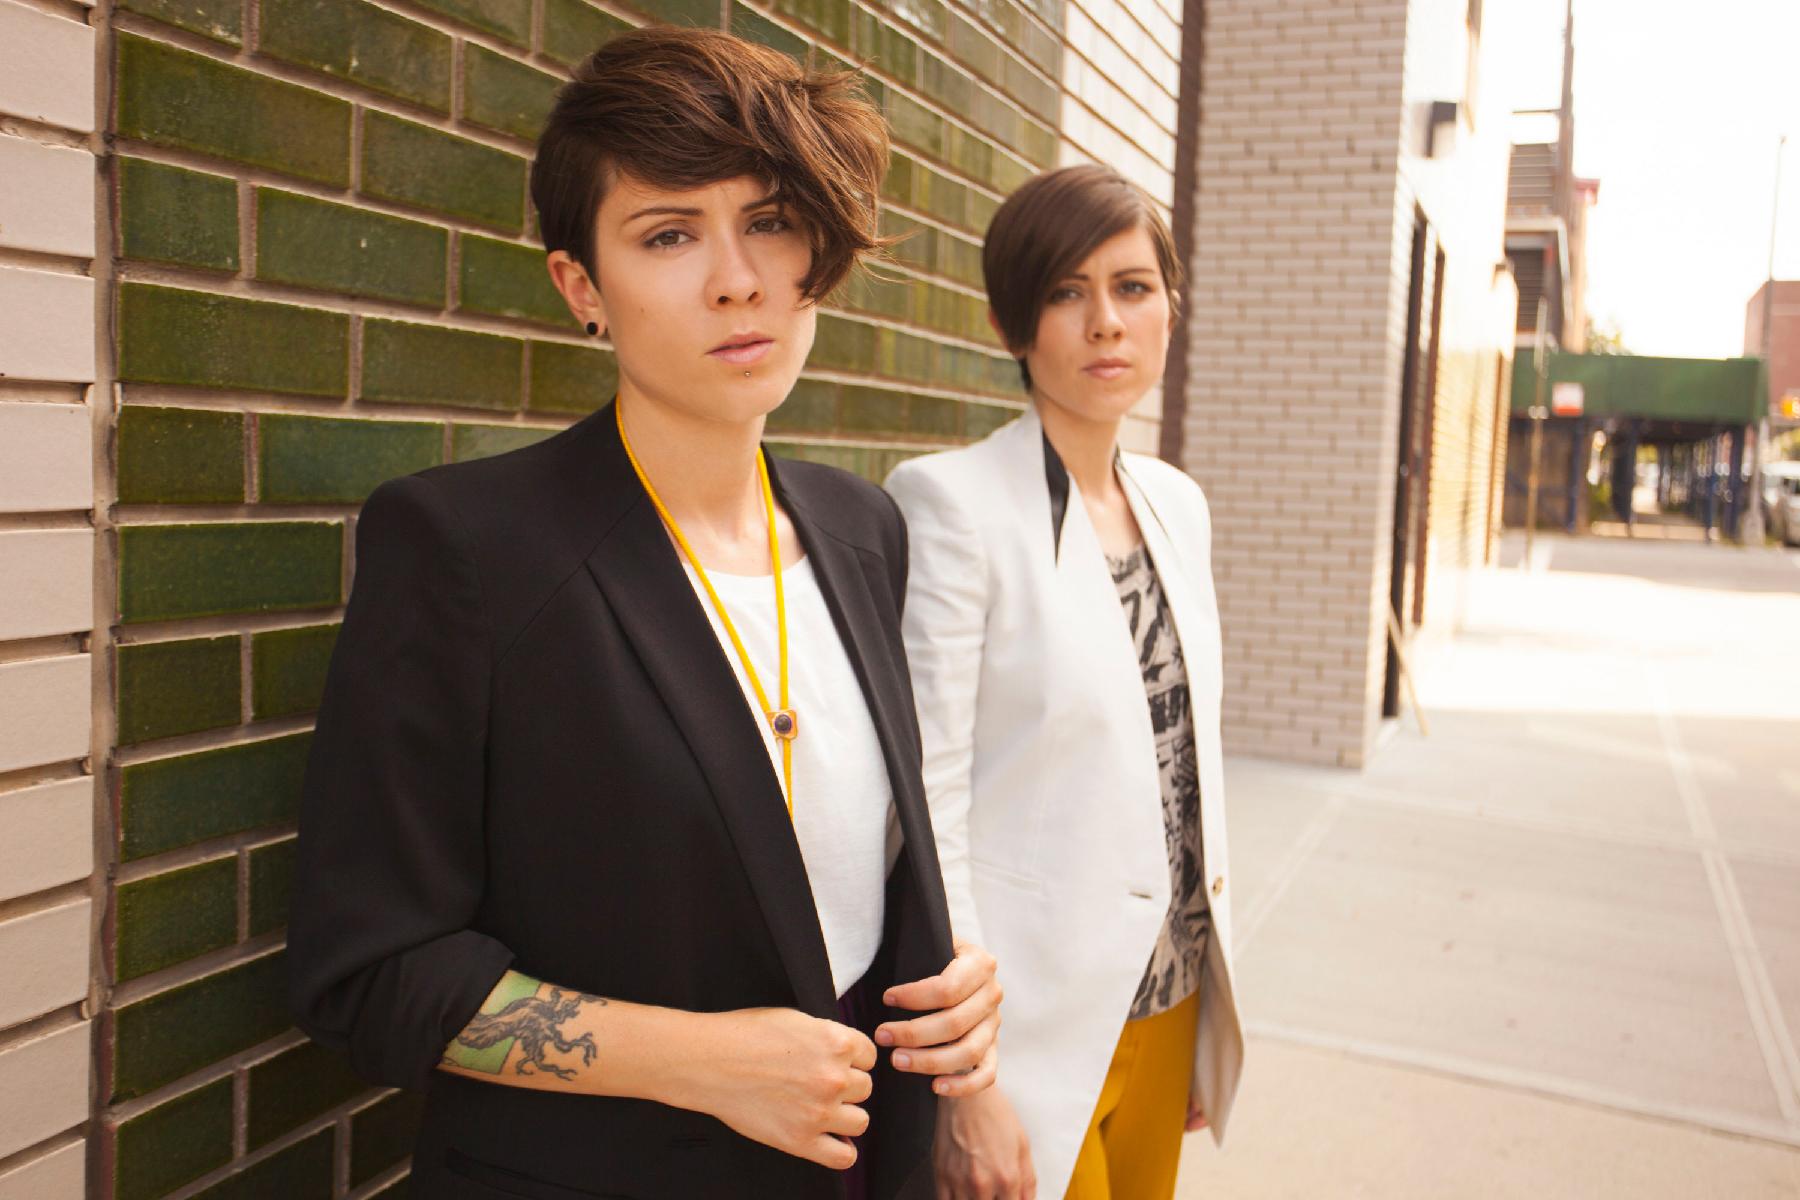 Hear Tegan and Sara's Valentine's Day Playlist